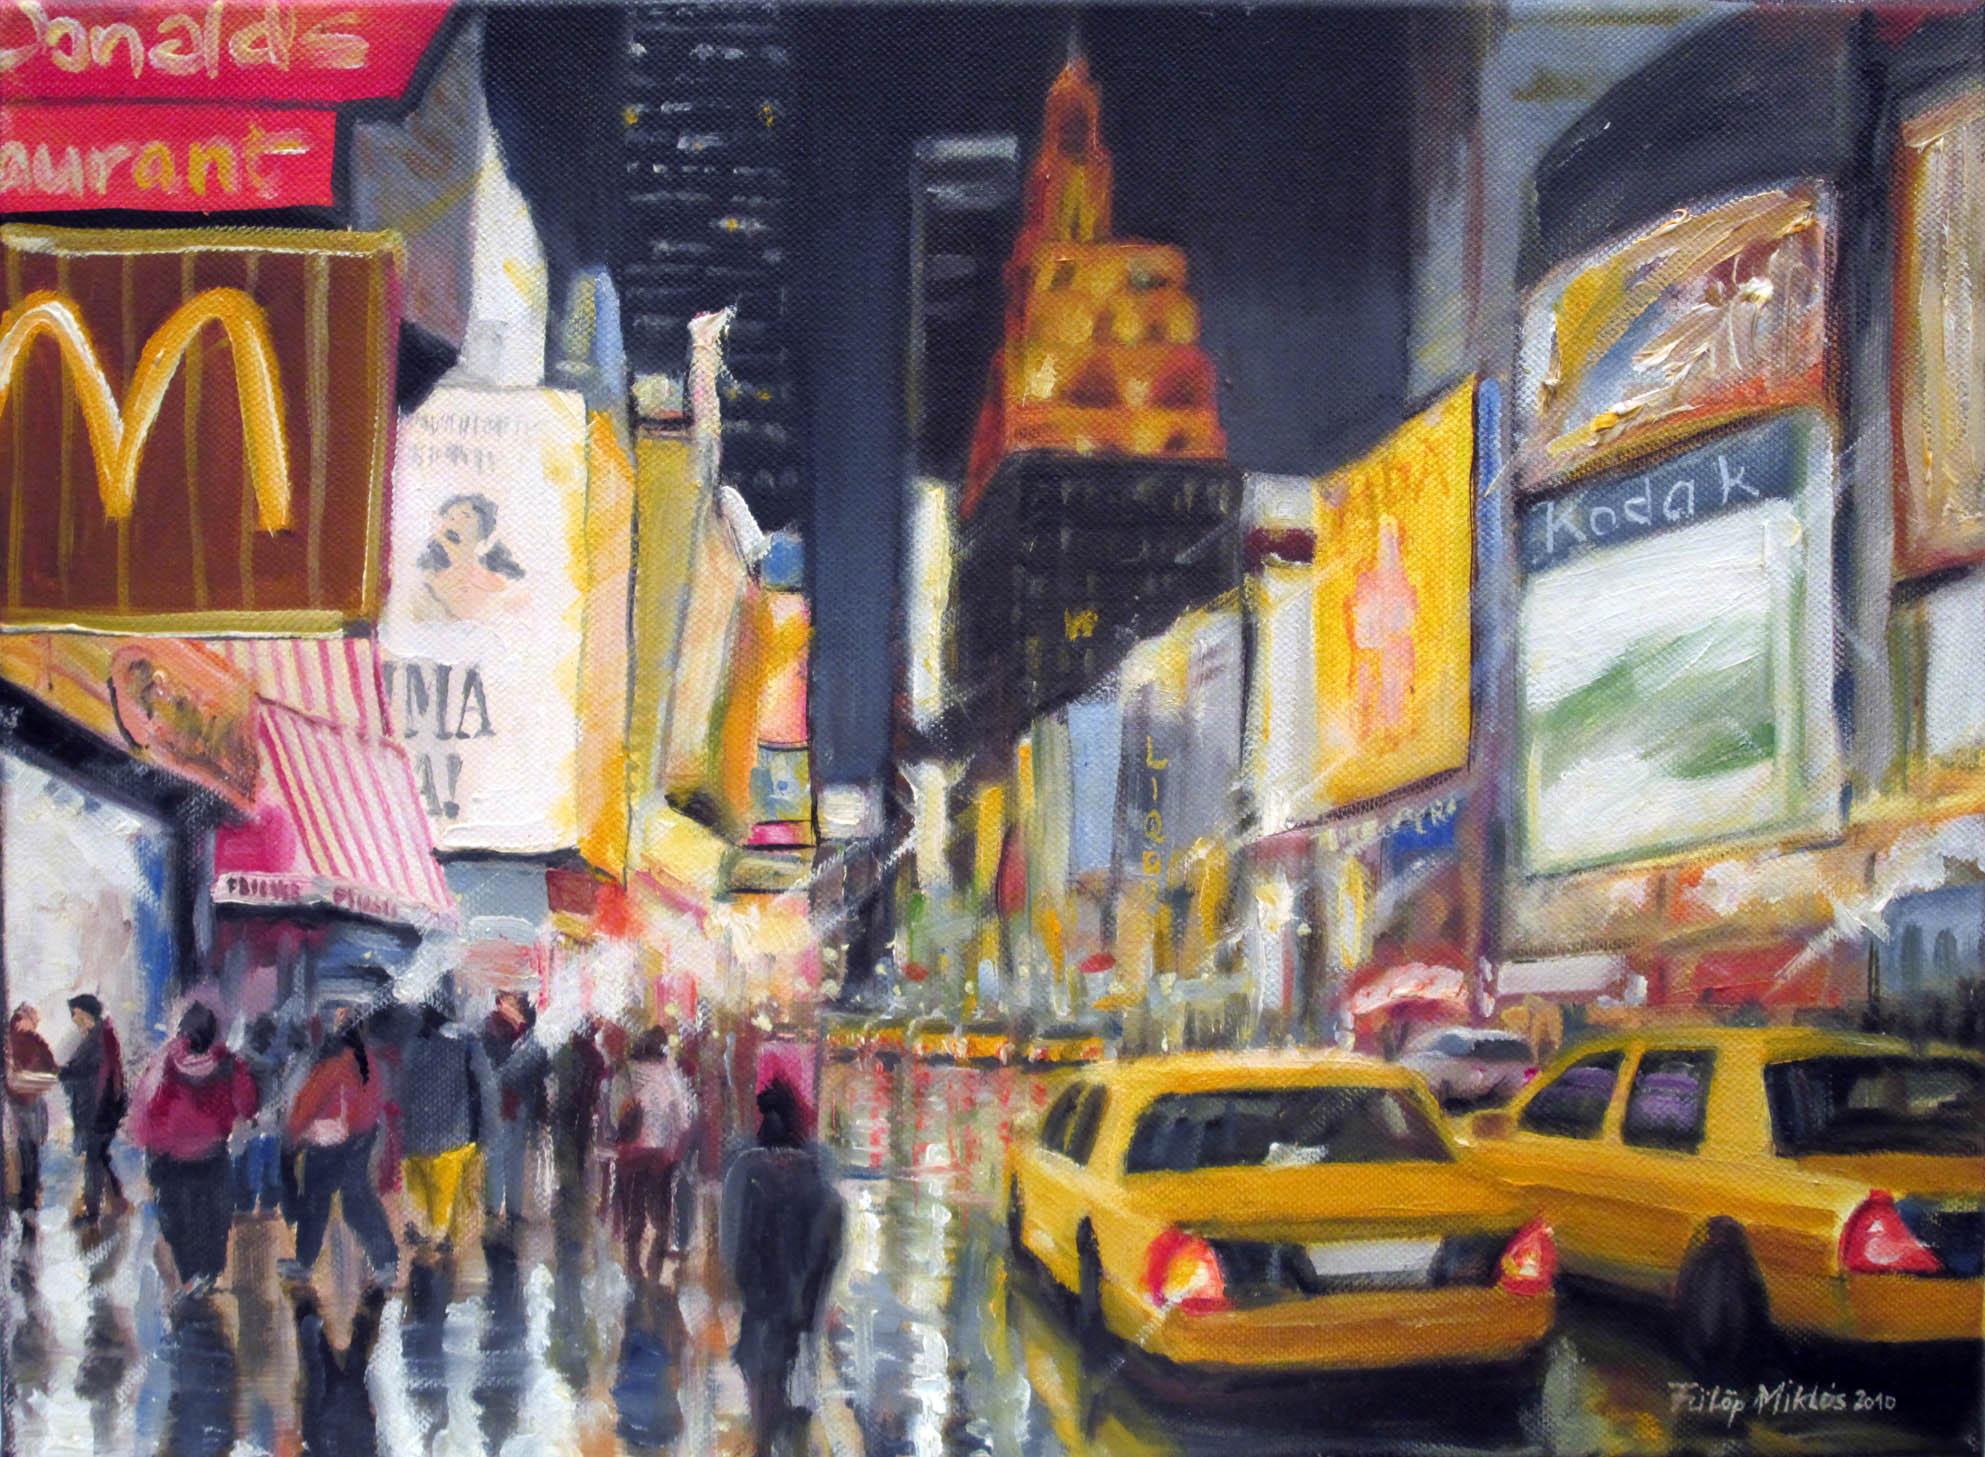 Times Square<br />30x40 cm, olaj/vászon (2010)<br />29 000 Ft